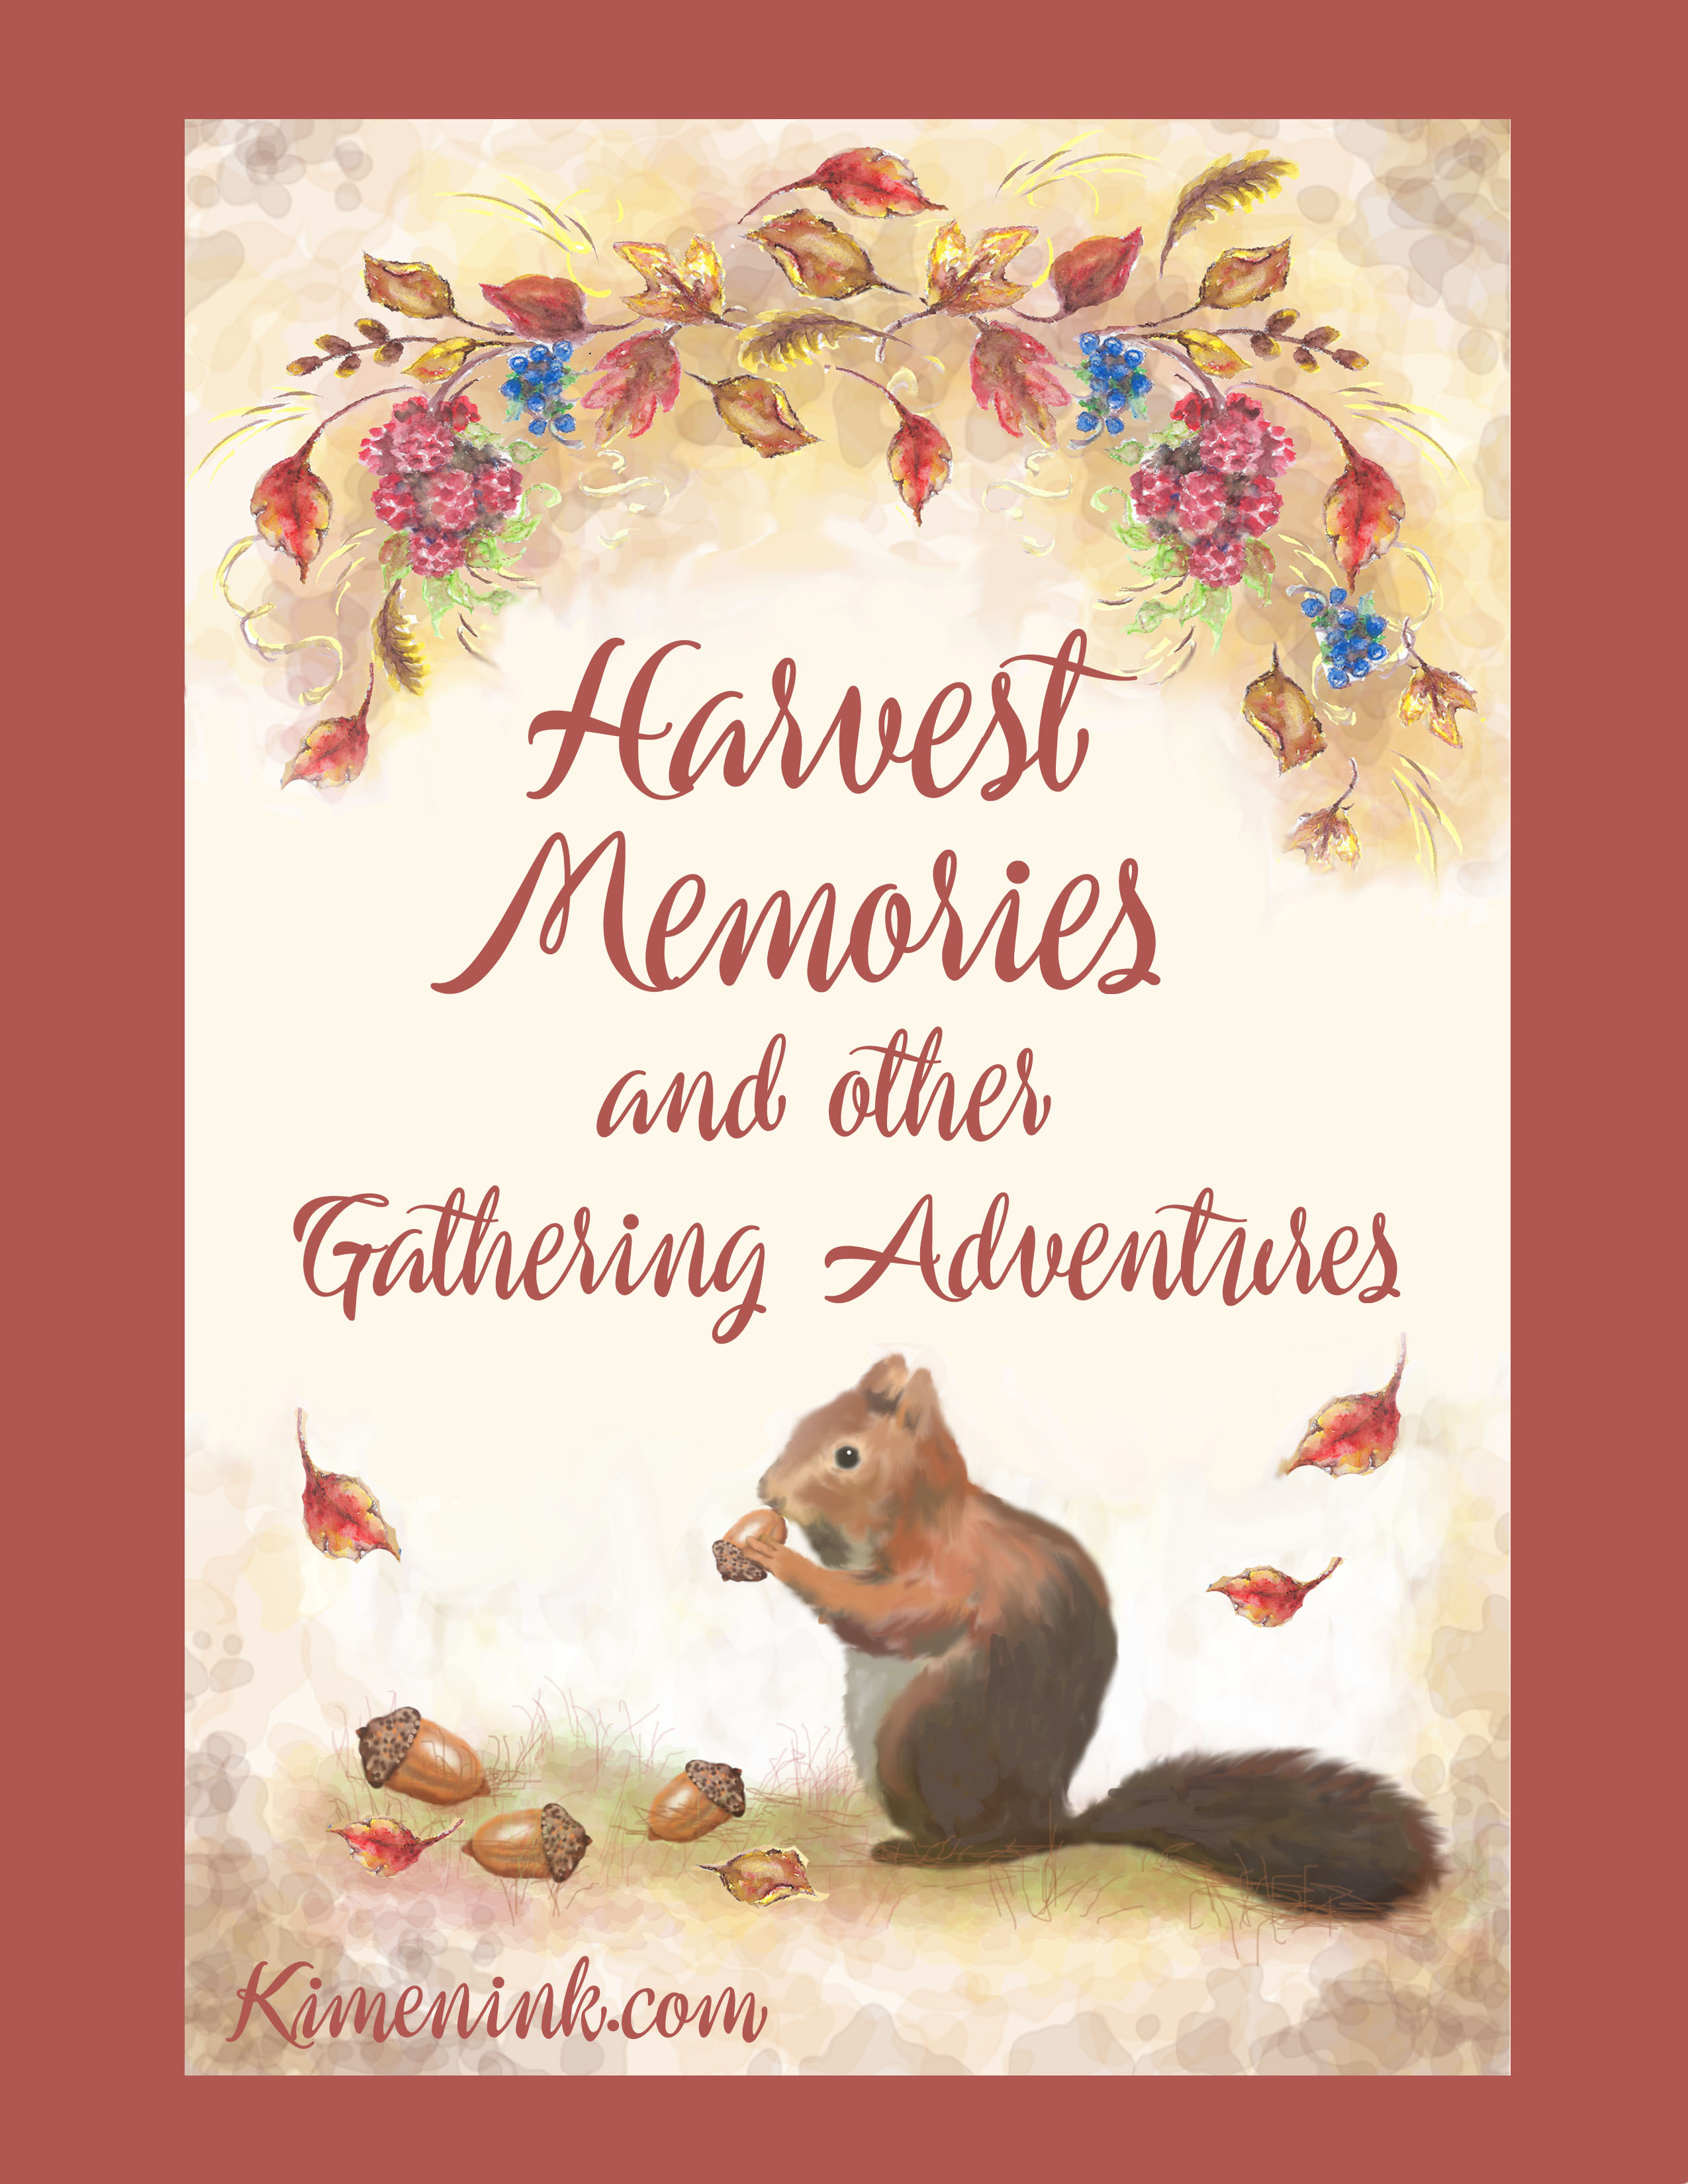 Harvest Memories and Other Gathering Adventures Kimenink